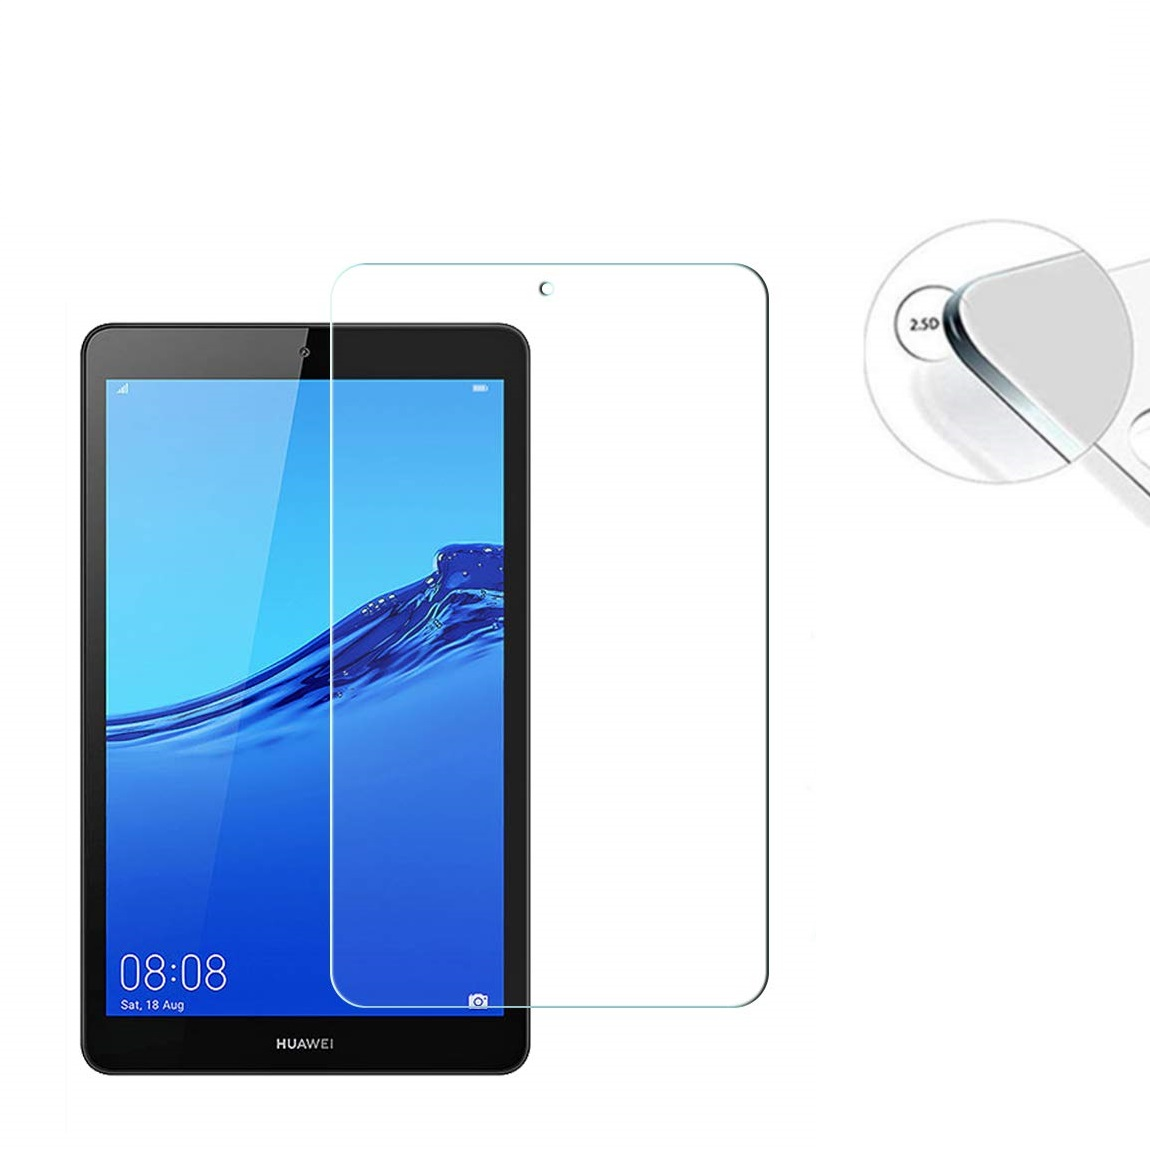 HUAWEI MediaPad M5 Lite 8.0 強化ガラス JDN2-L09 対応 【送料無料】HUAWEI MediaPad M5 Lite 8.0 強化ガラス 液晶保護フィルム ガラスフィルム 耐指紋 撥油性 表面硬度 9H 業界最薄0.3mmのガラスを採用 2.5D ラウンドエッジ加工 JDN2-L09 対応